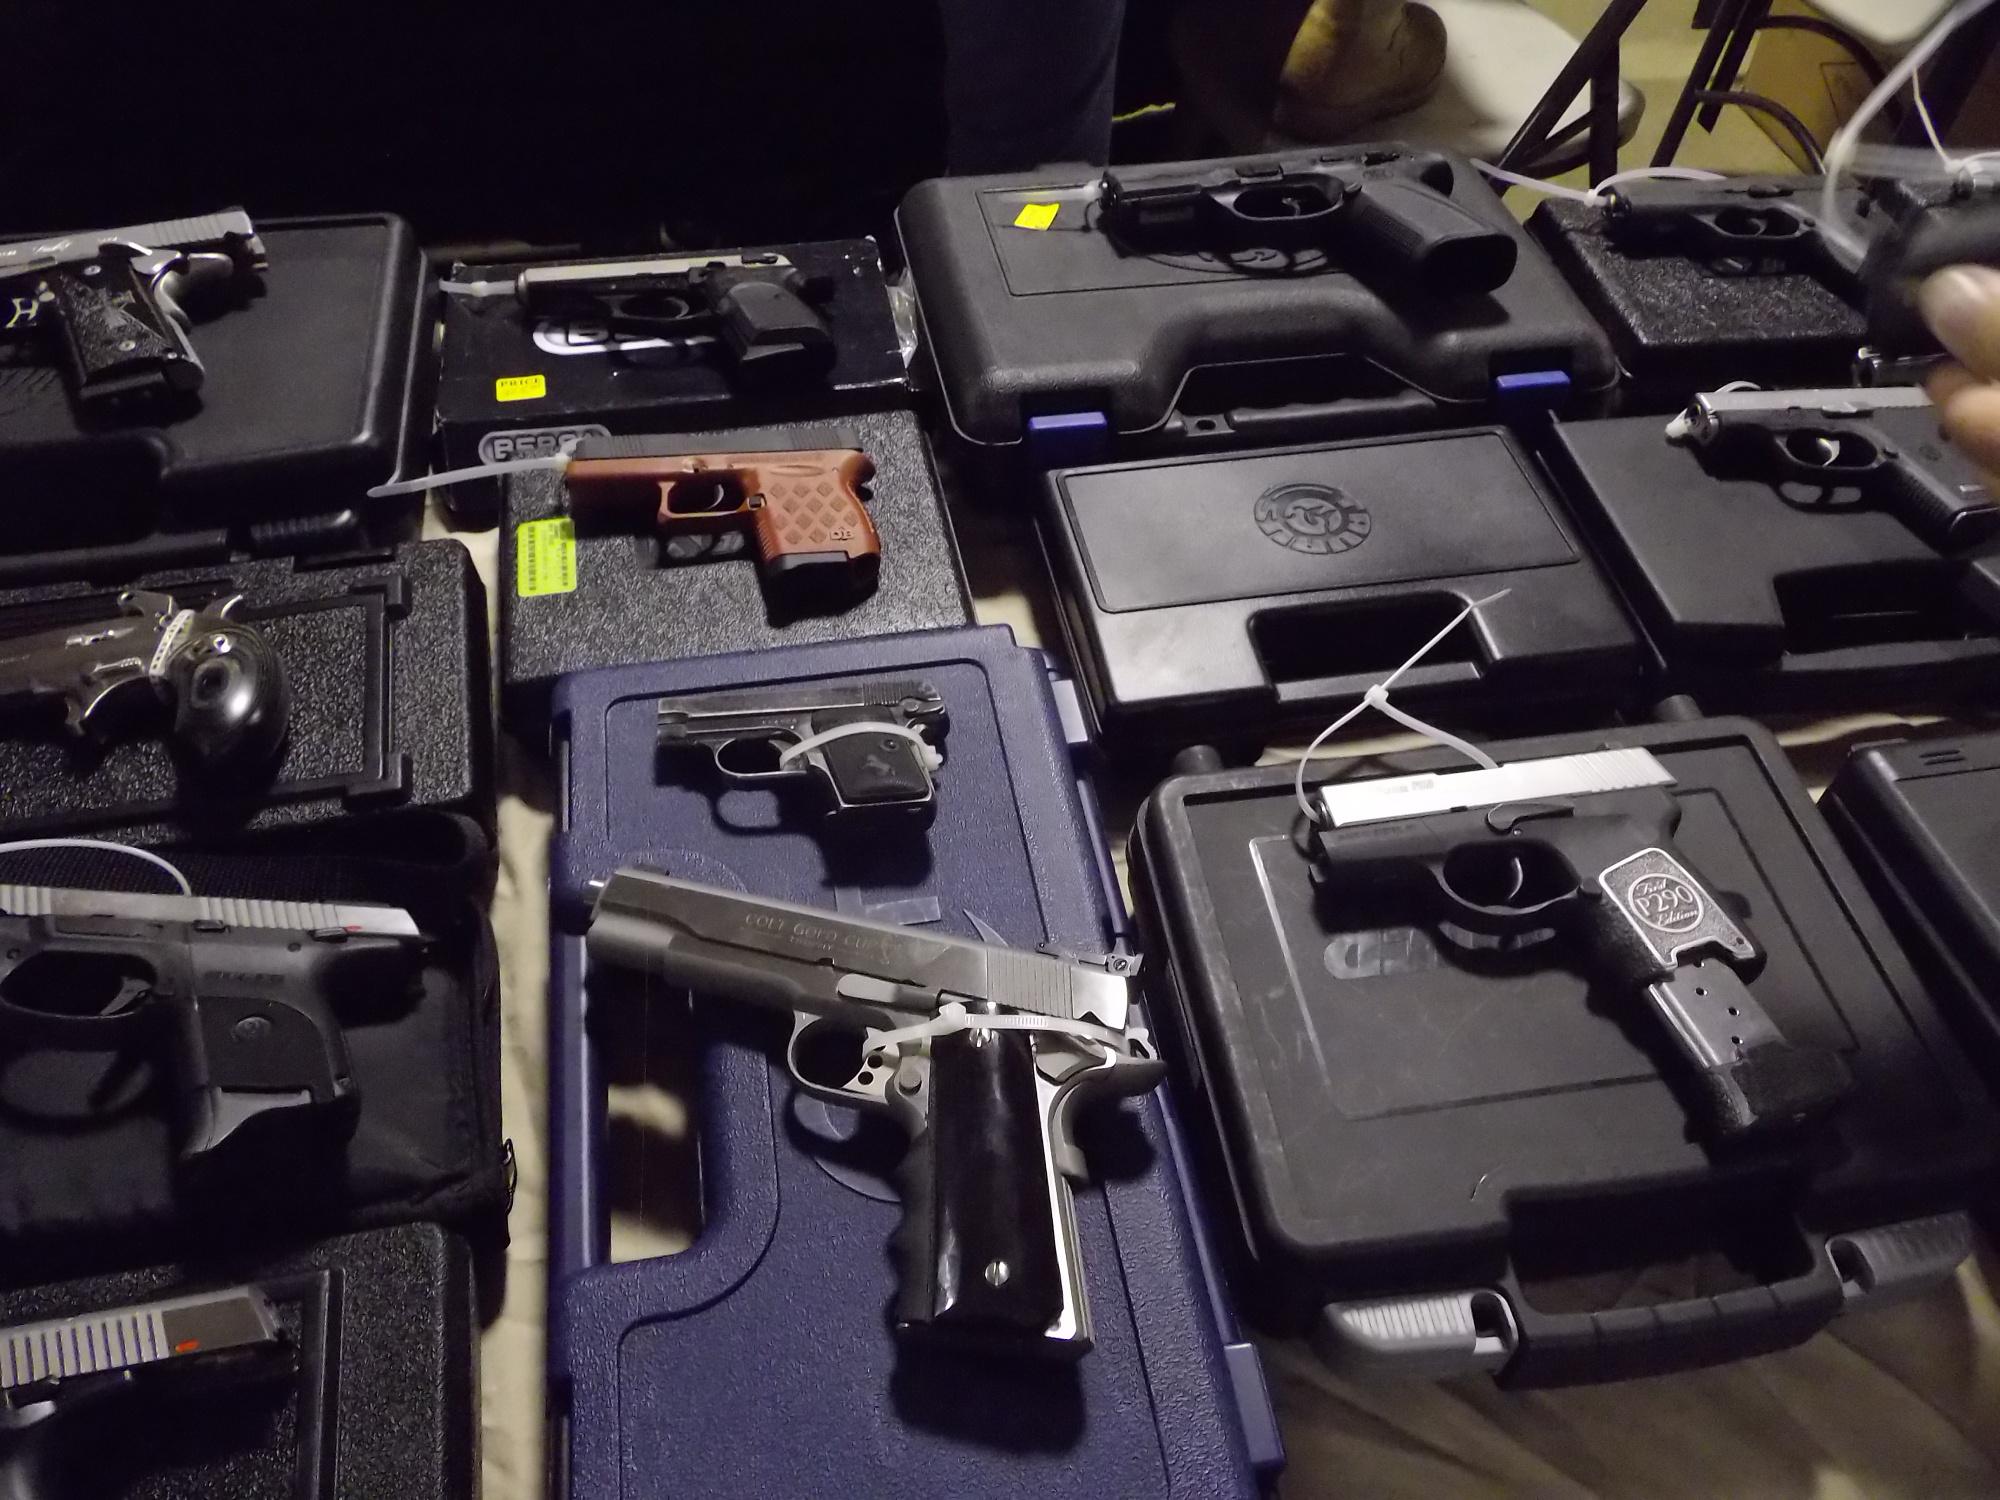 gun sale in Florida